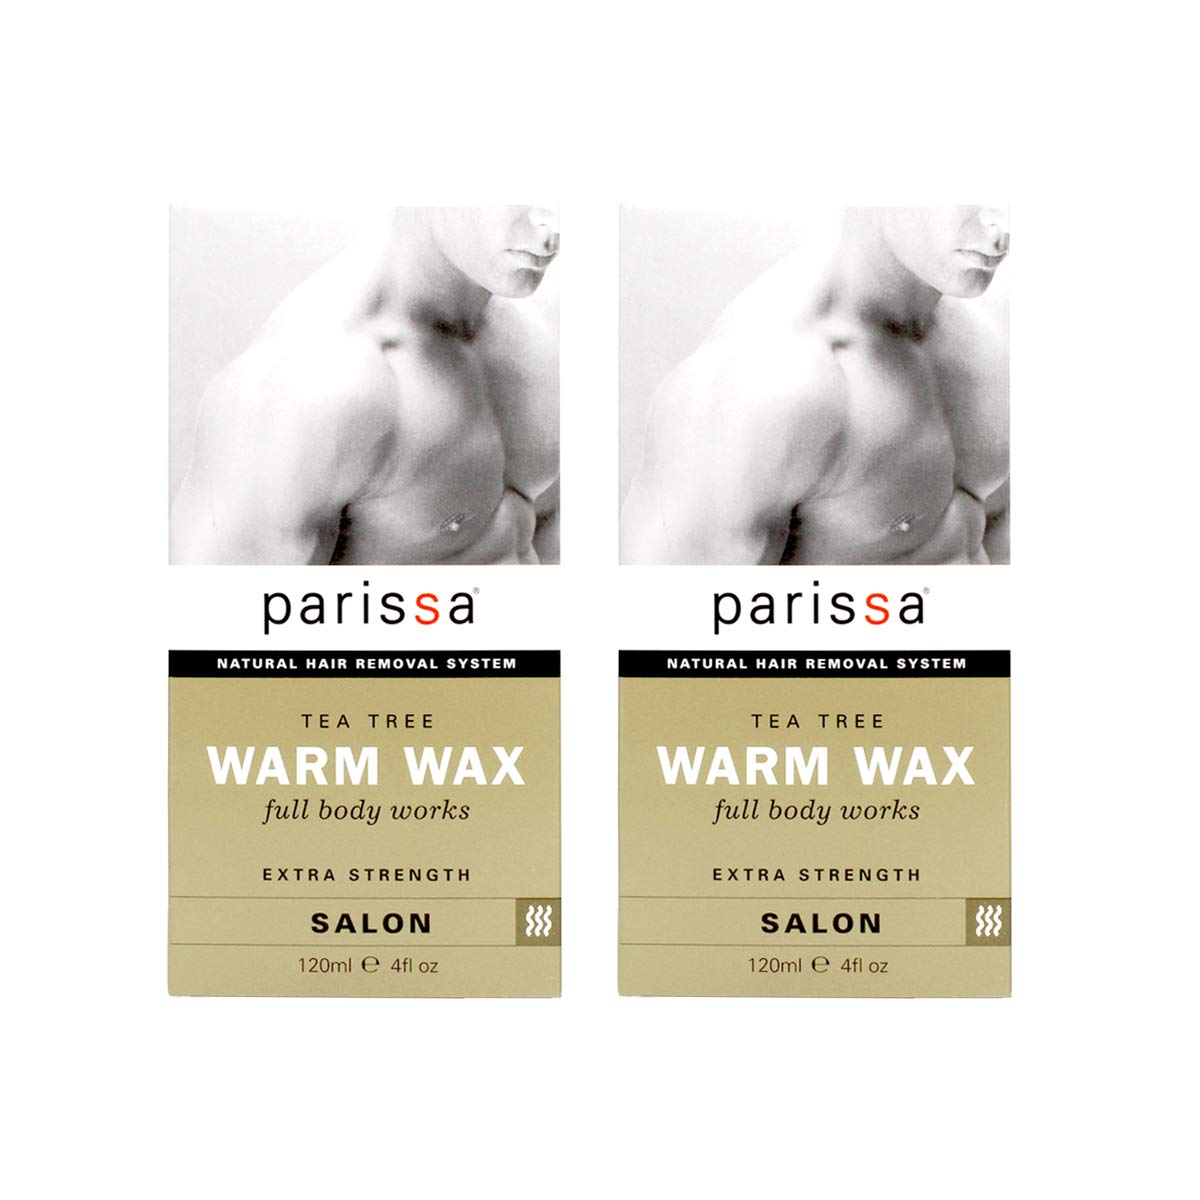 Parissa Warm Body Waxing Kit for Men, 4 Fl. Oz. Pack Of 2